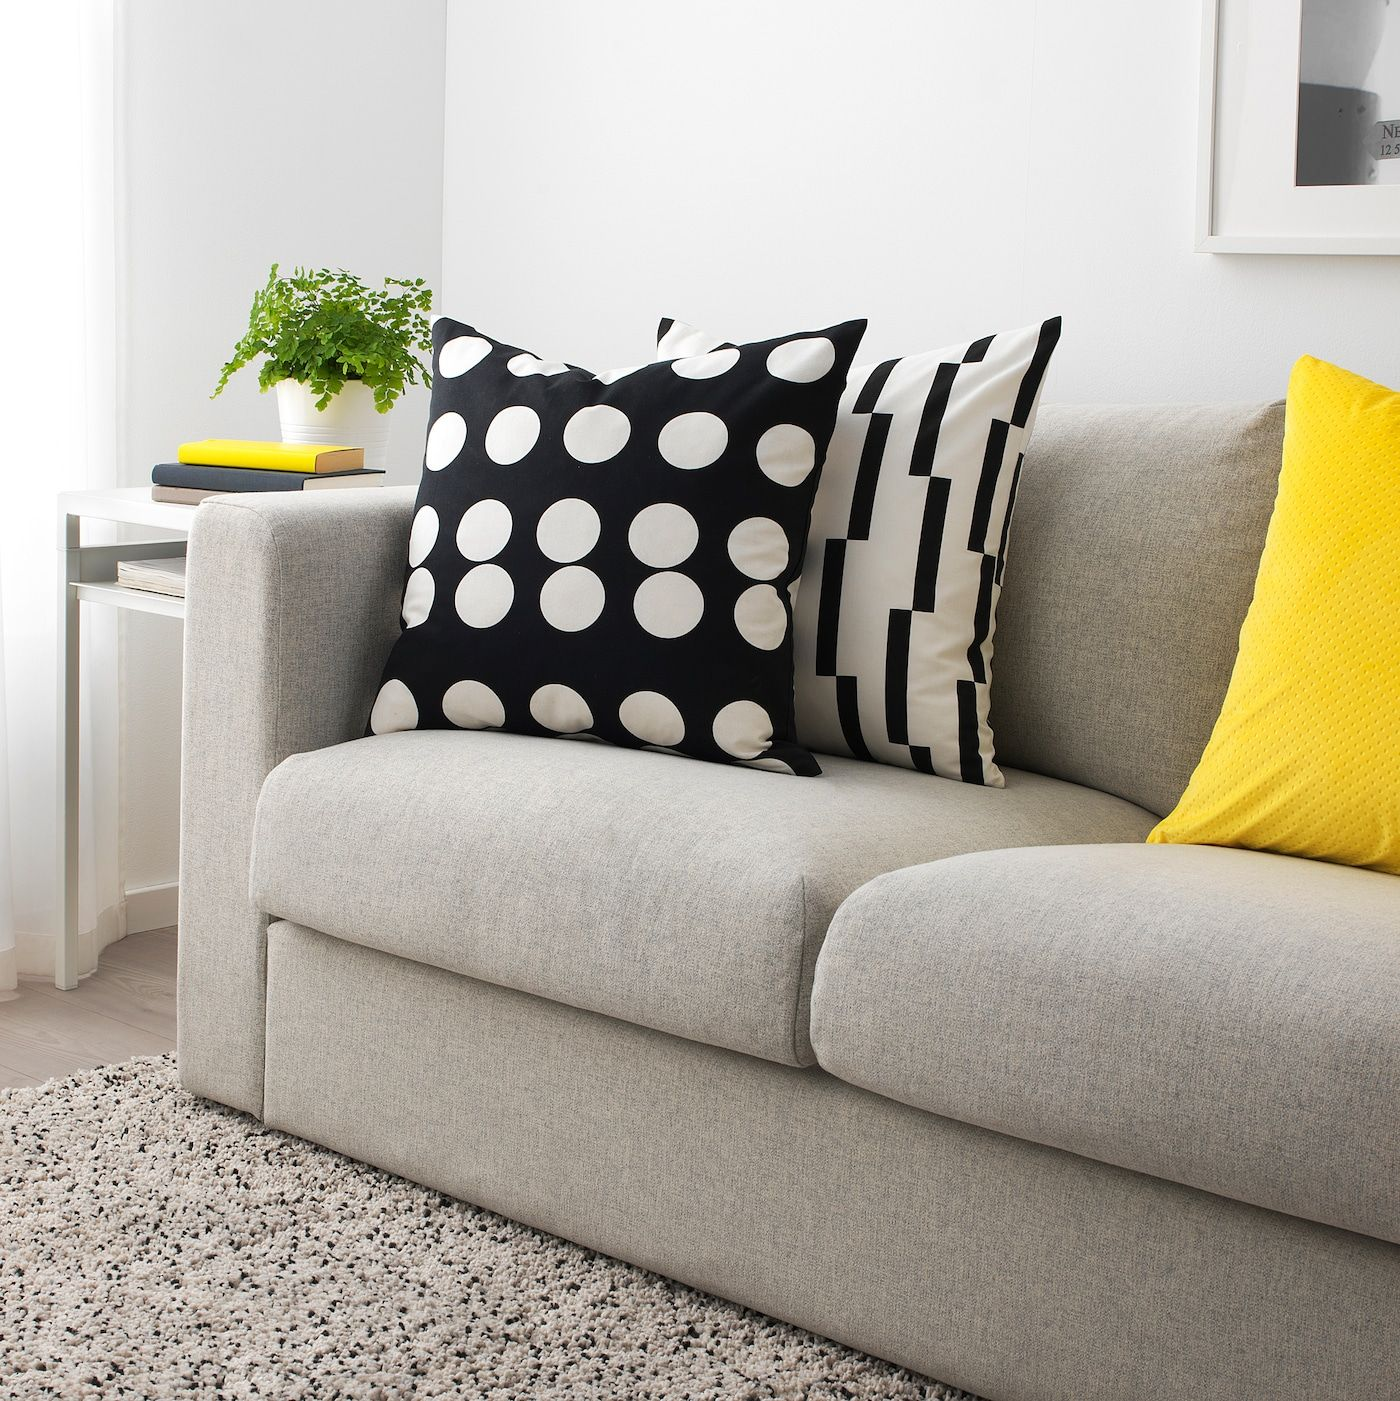 IKEA US Furniture and Home Furnishings | Cushion cover